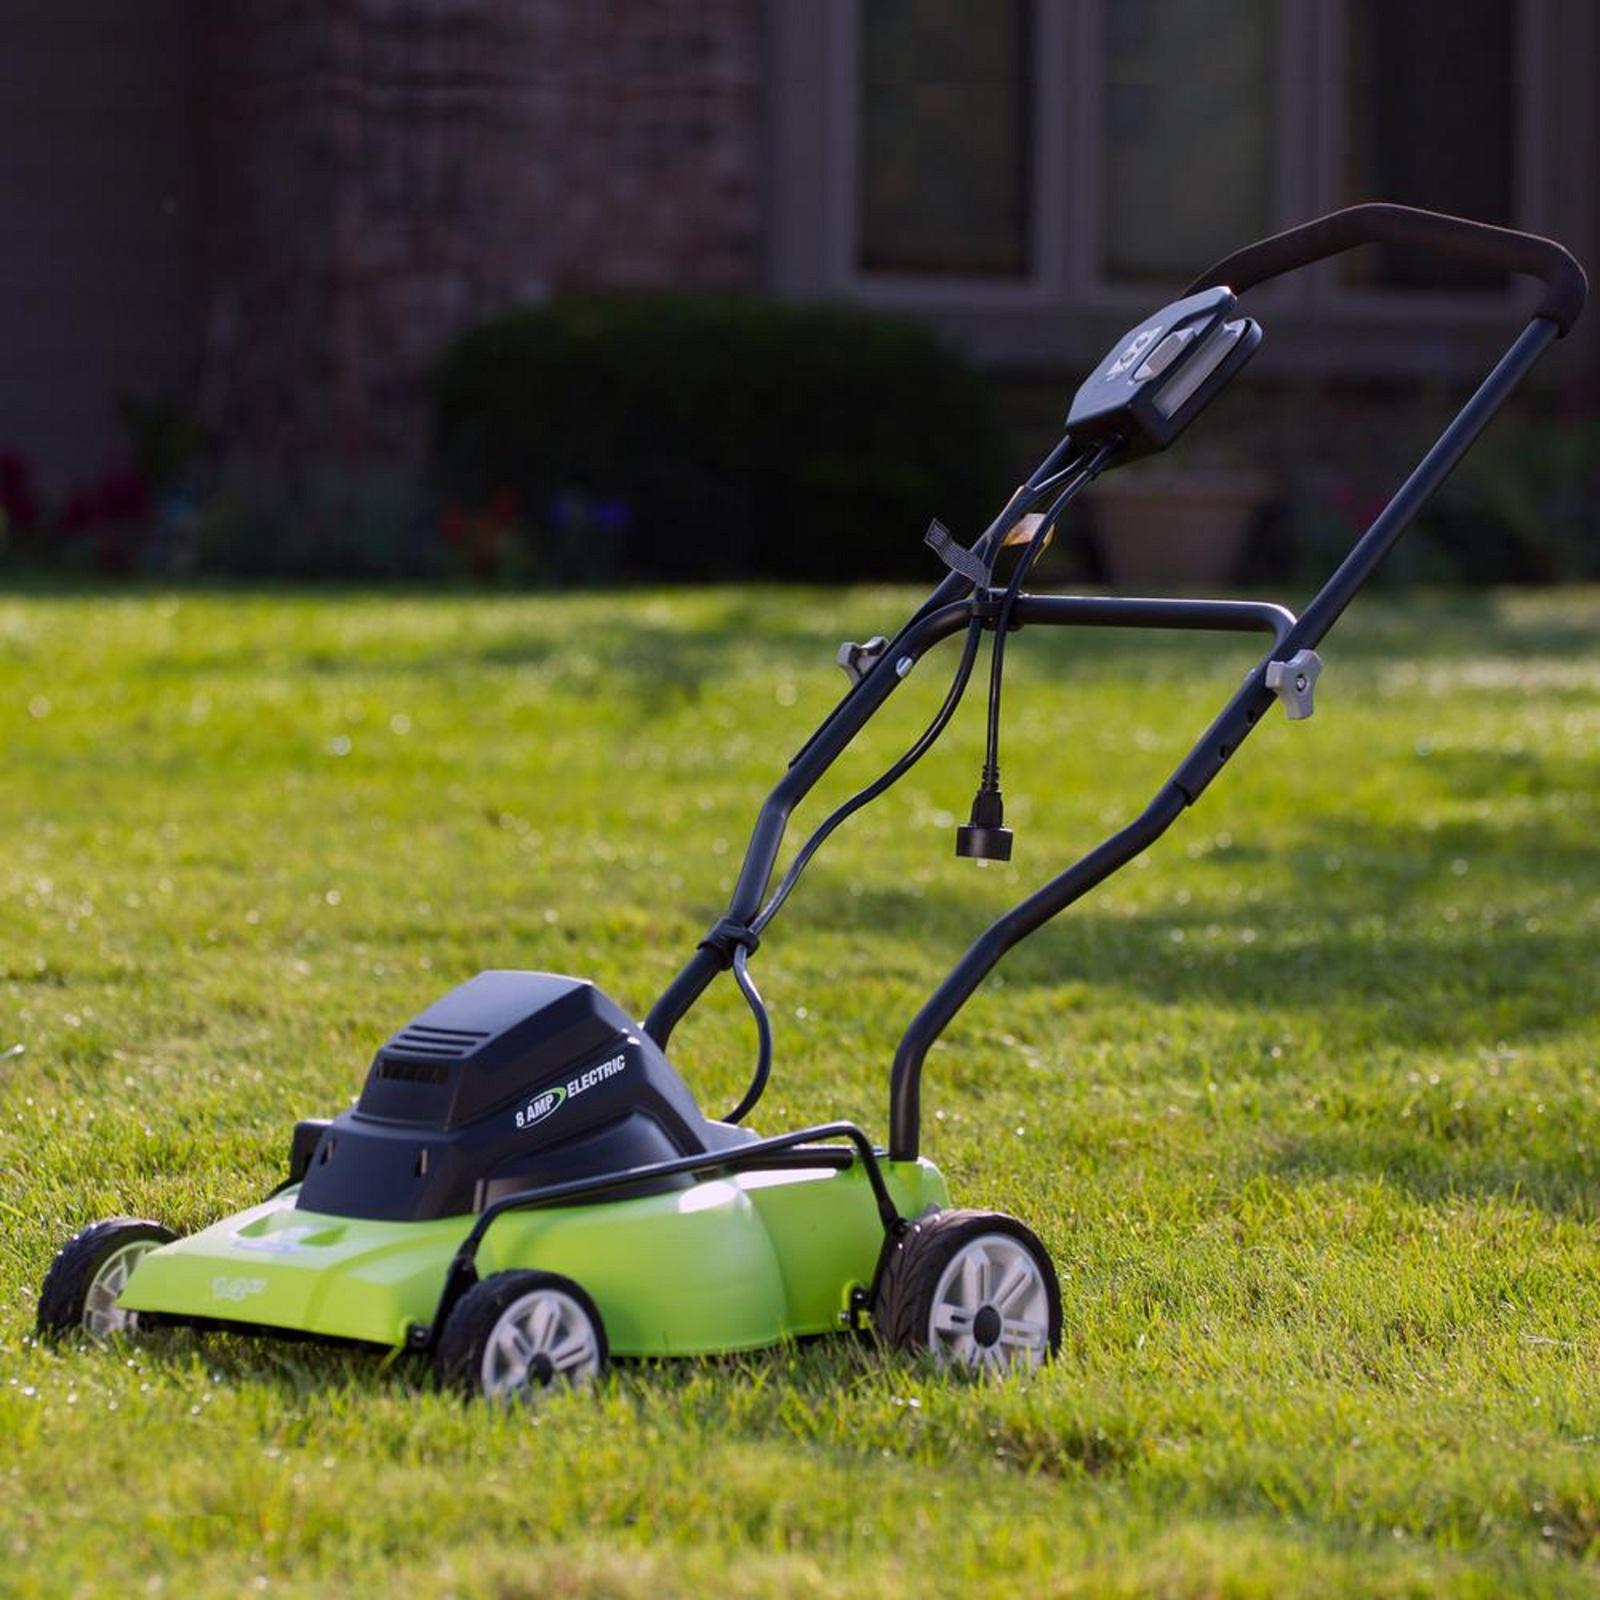 walk behind lawnmower corded electric 120 volt push single. Black Bedroom Furniture Sets. Home Design Ideas